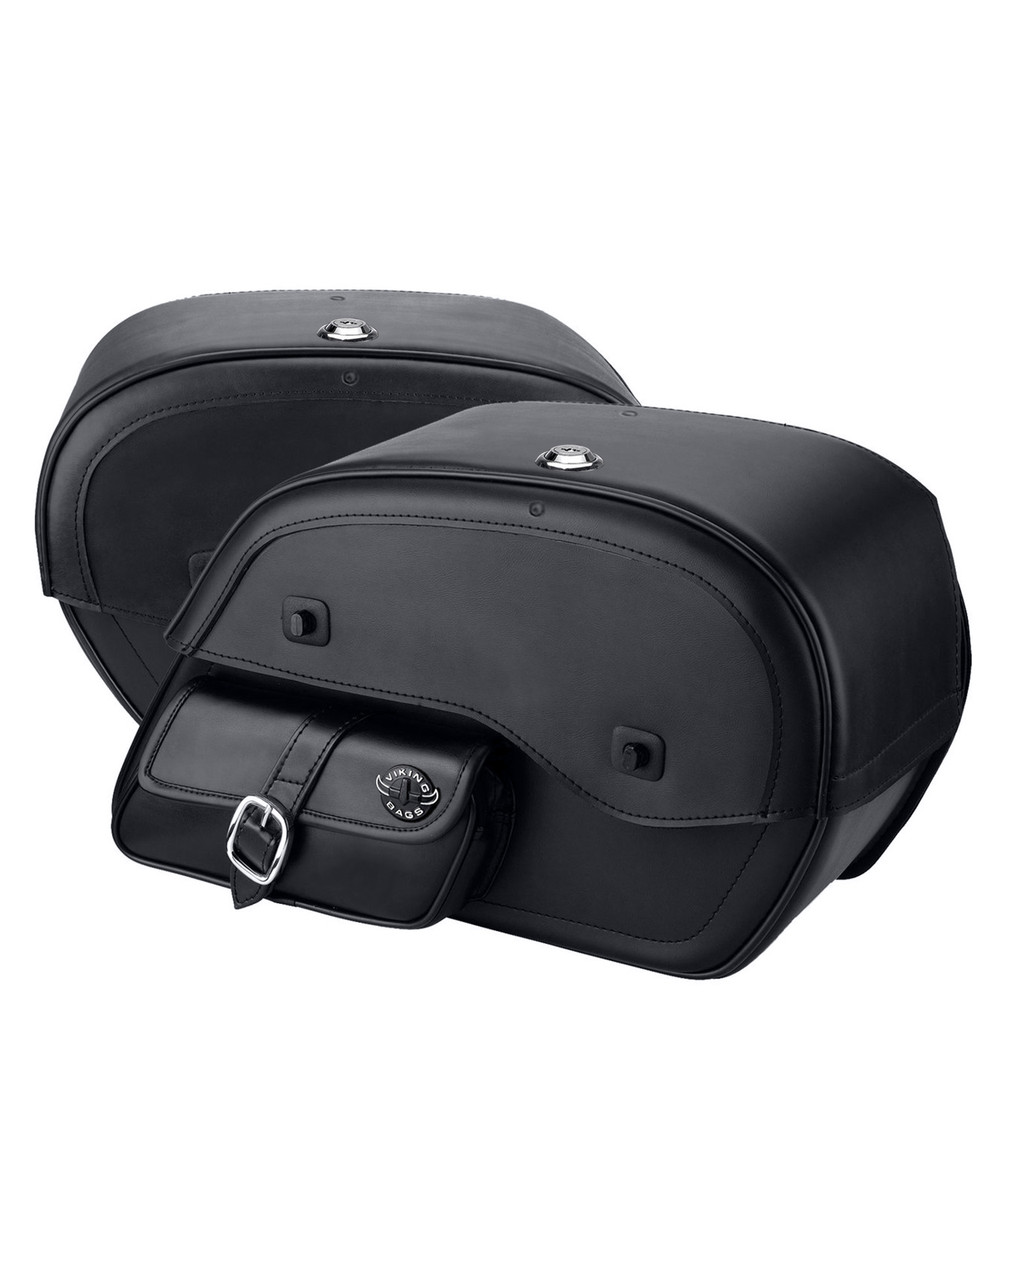 Honda 1100 Shadow Spirit Side Pocket Motorcycle Saddlebags Both  bag View